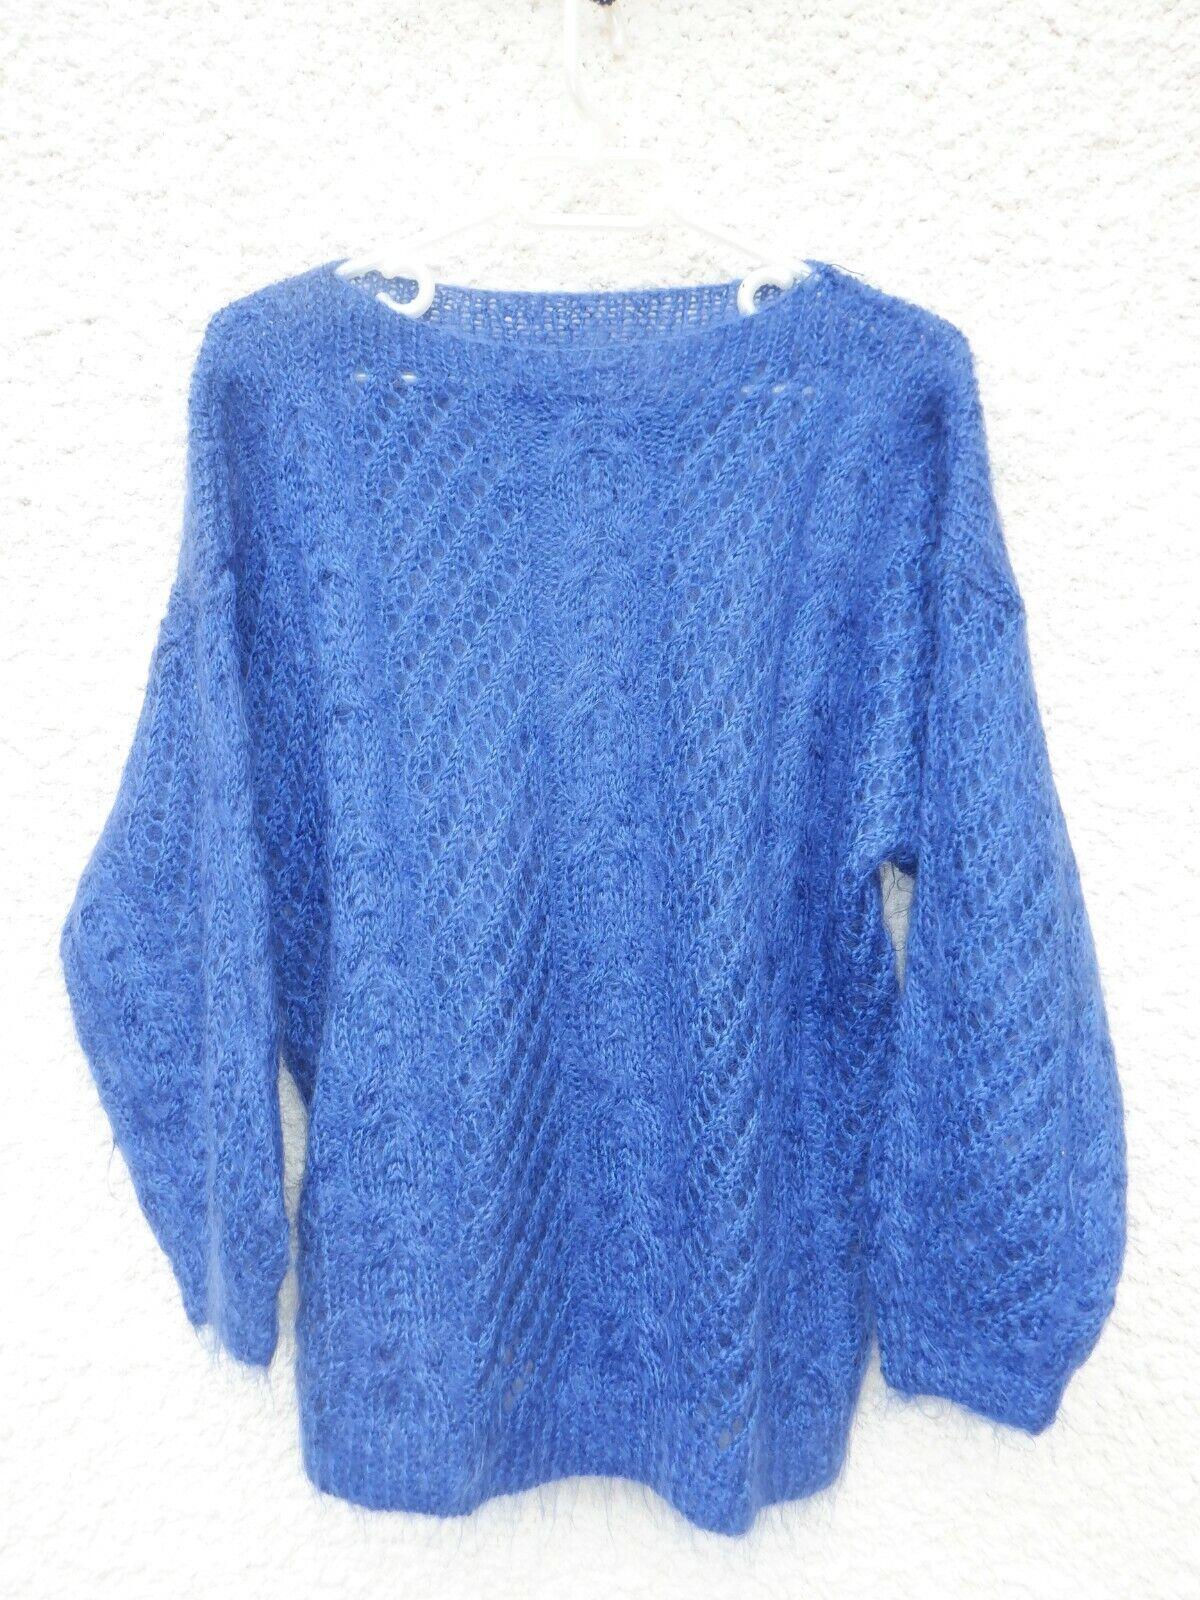 beau pull neuf bleu tricoté mains laine mohair t44/46